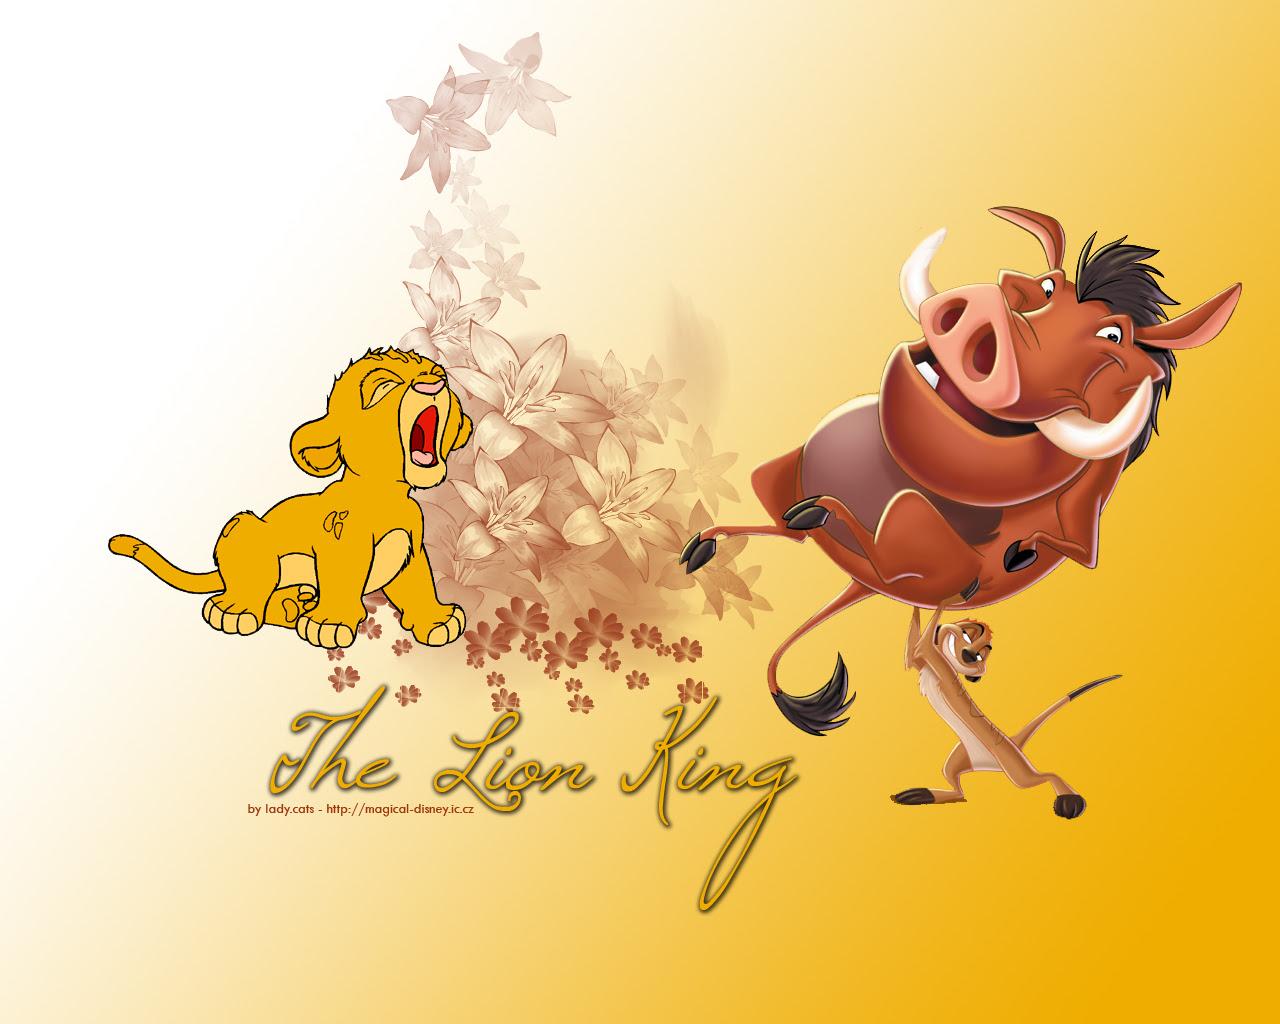 The Lion King ディズニークラシックス 壁紙 4693936 ファンポップ